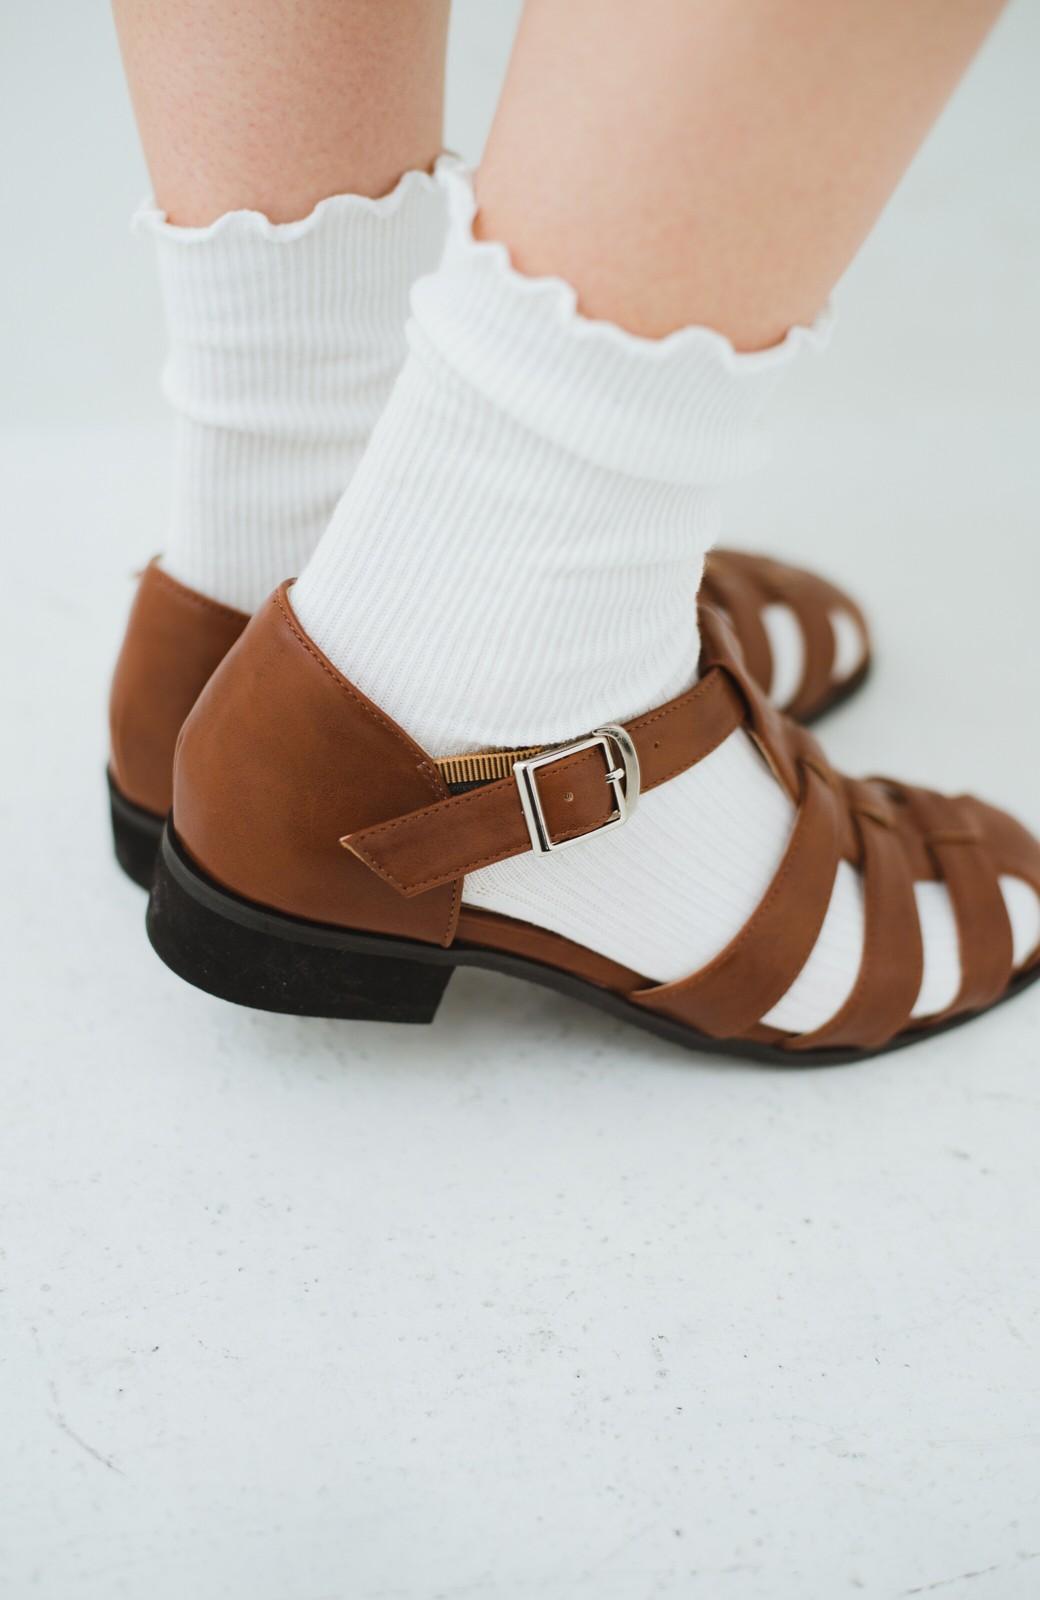 haco! 靴下でも素足でも合う 本革風編み込みサンダル <ブラウン>の商品写真9